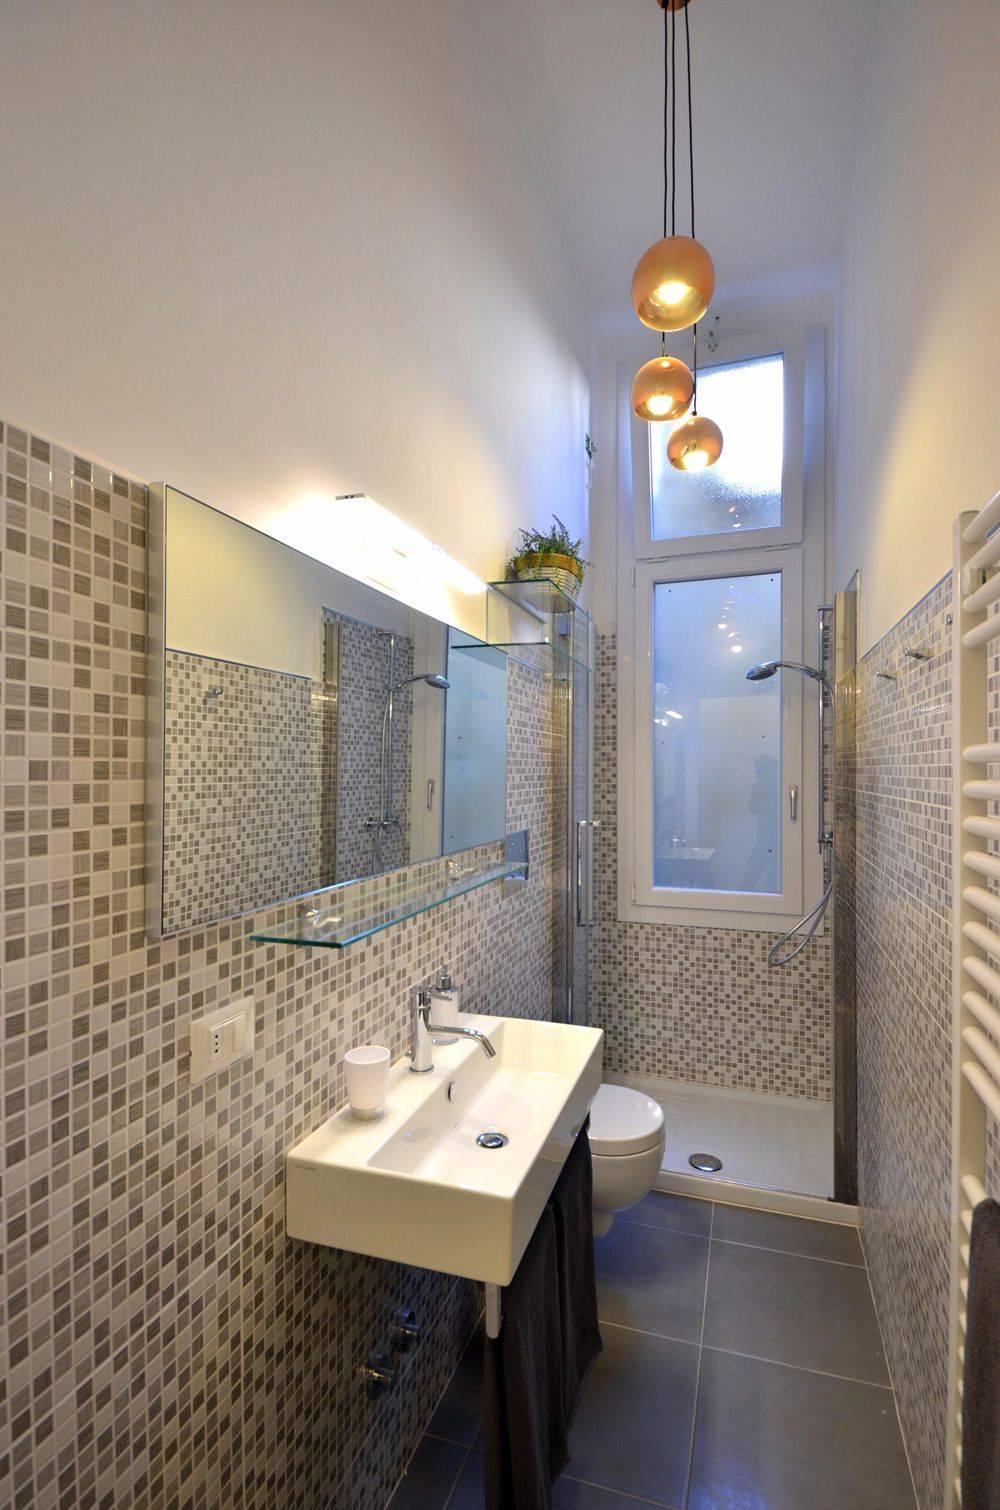 bathroom 2 of the Piano Nobile